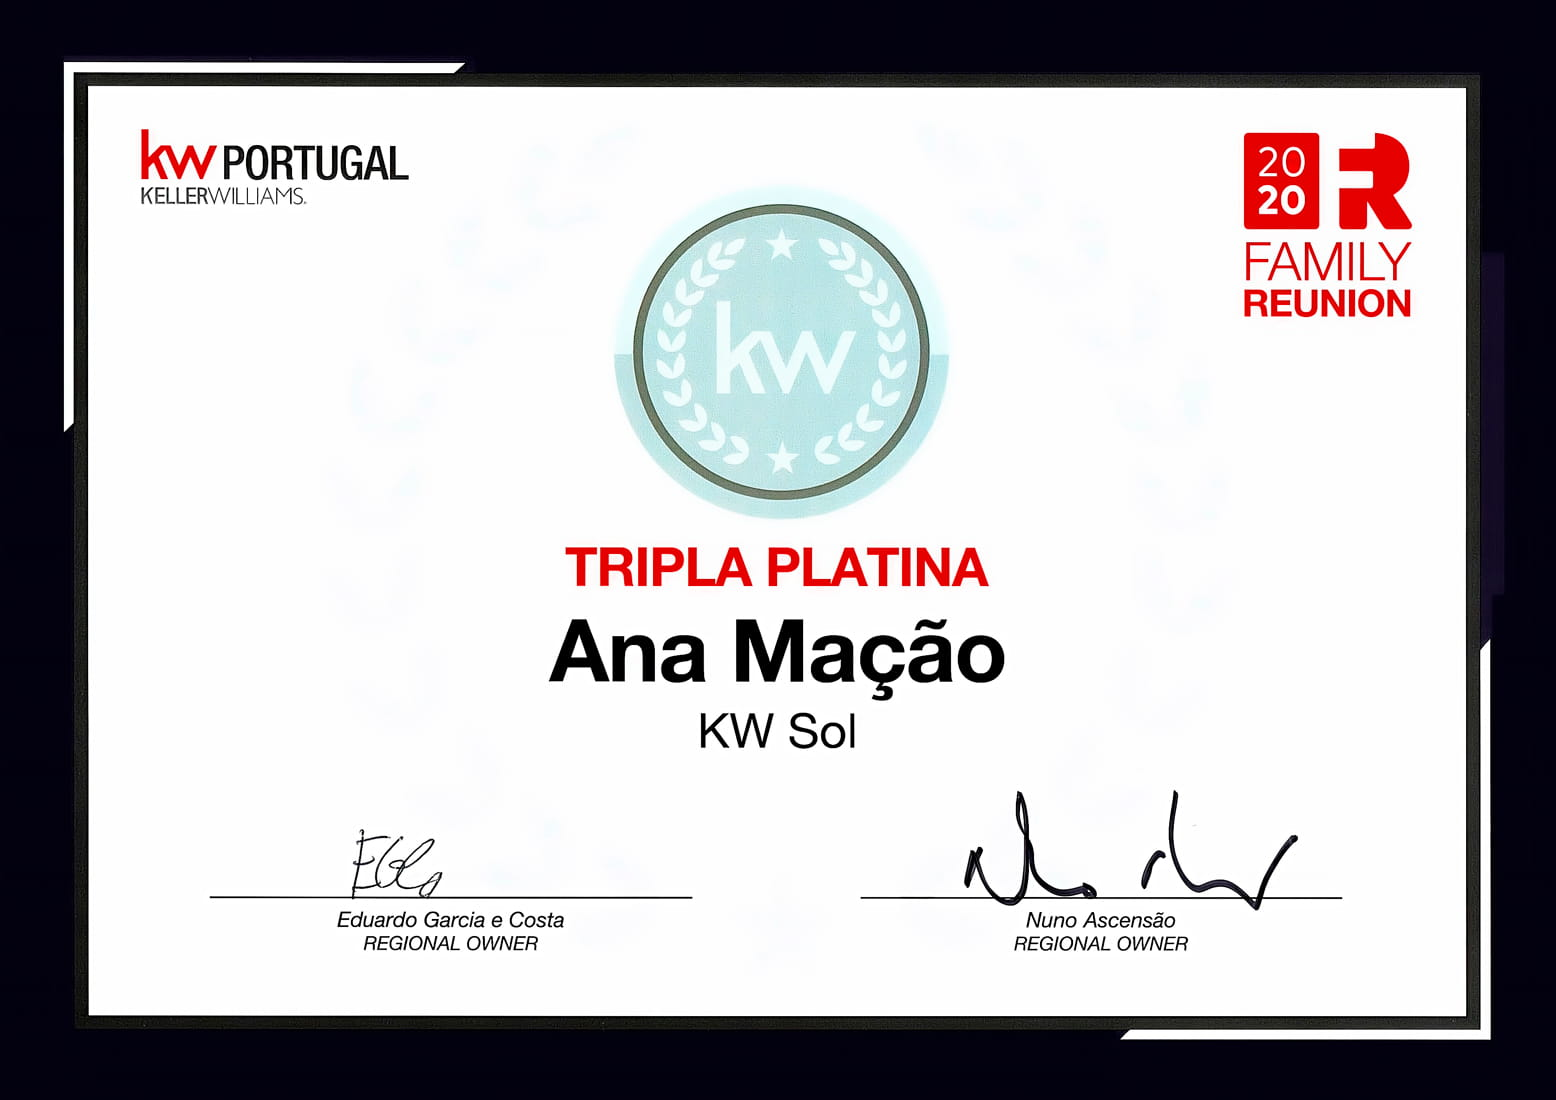 kw-premio-family-reunion-2019-2020-tripla-platina.jpg